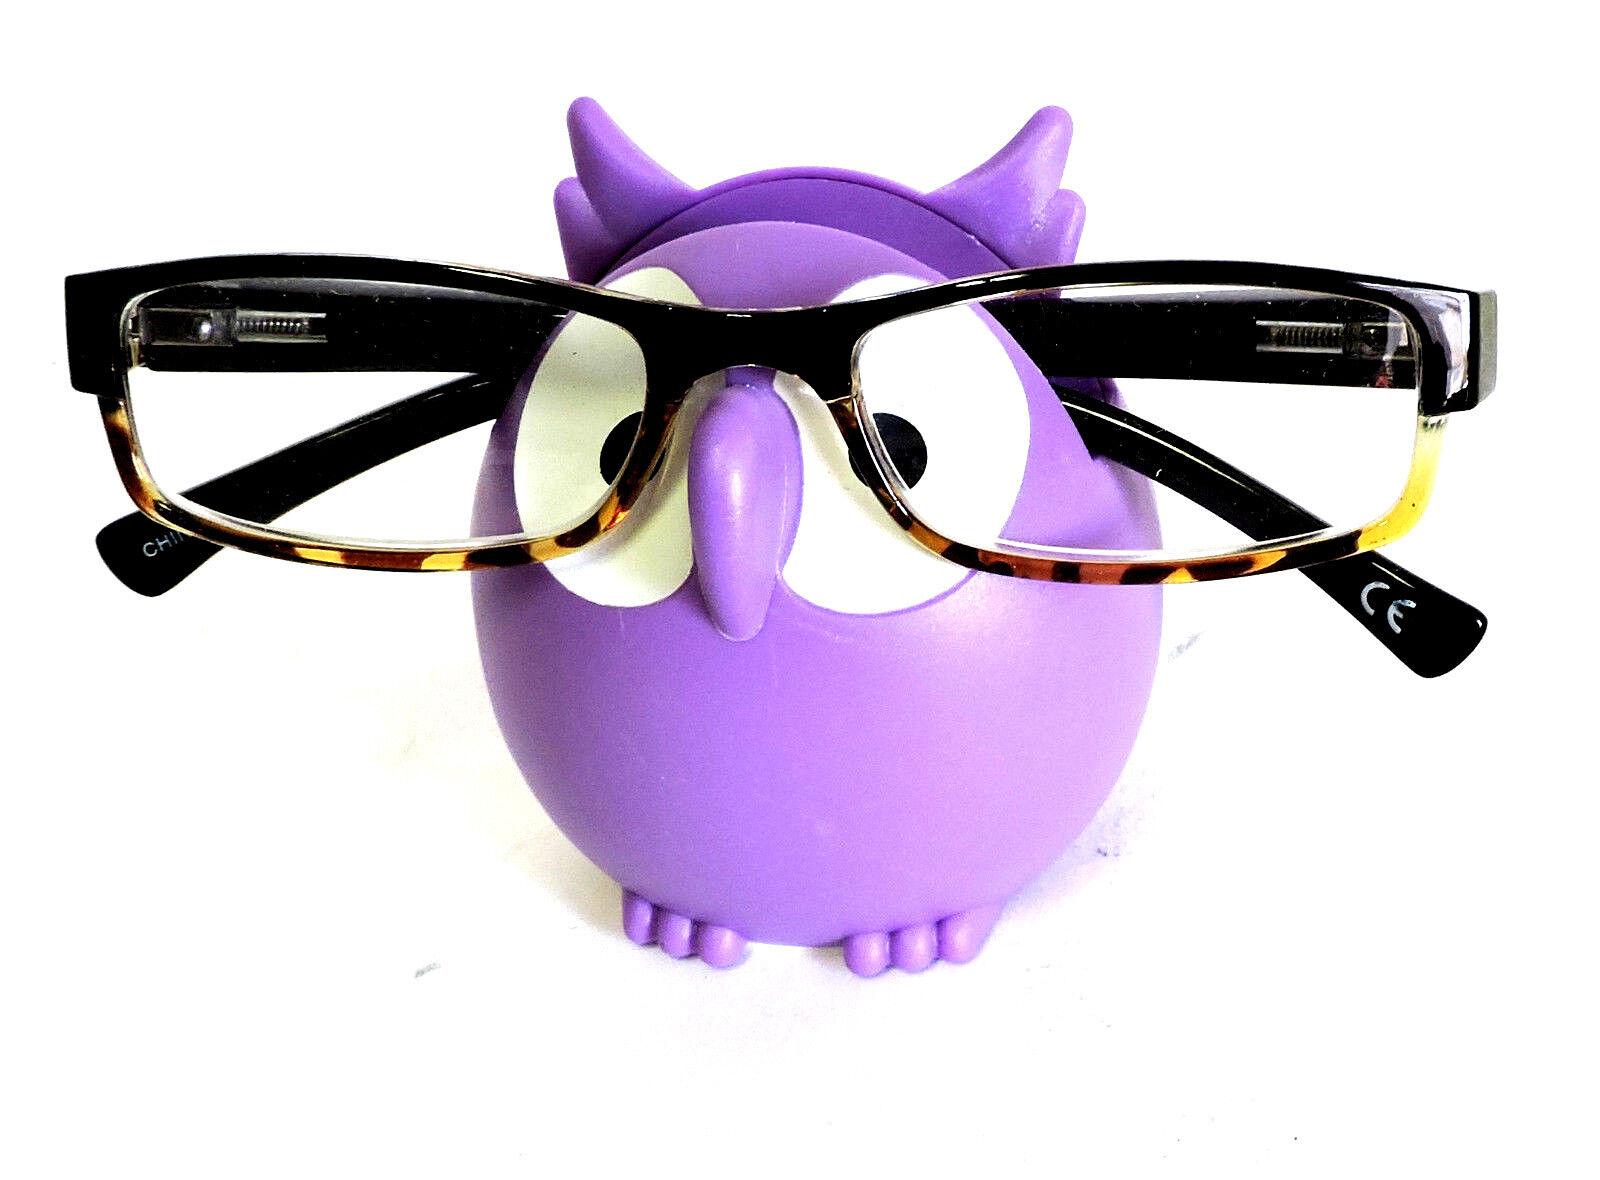 Owl Glasses Sunglasses Eyeglass Holder Stand Display Rack Sm